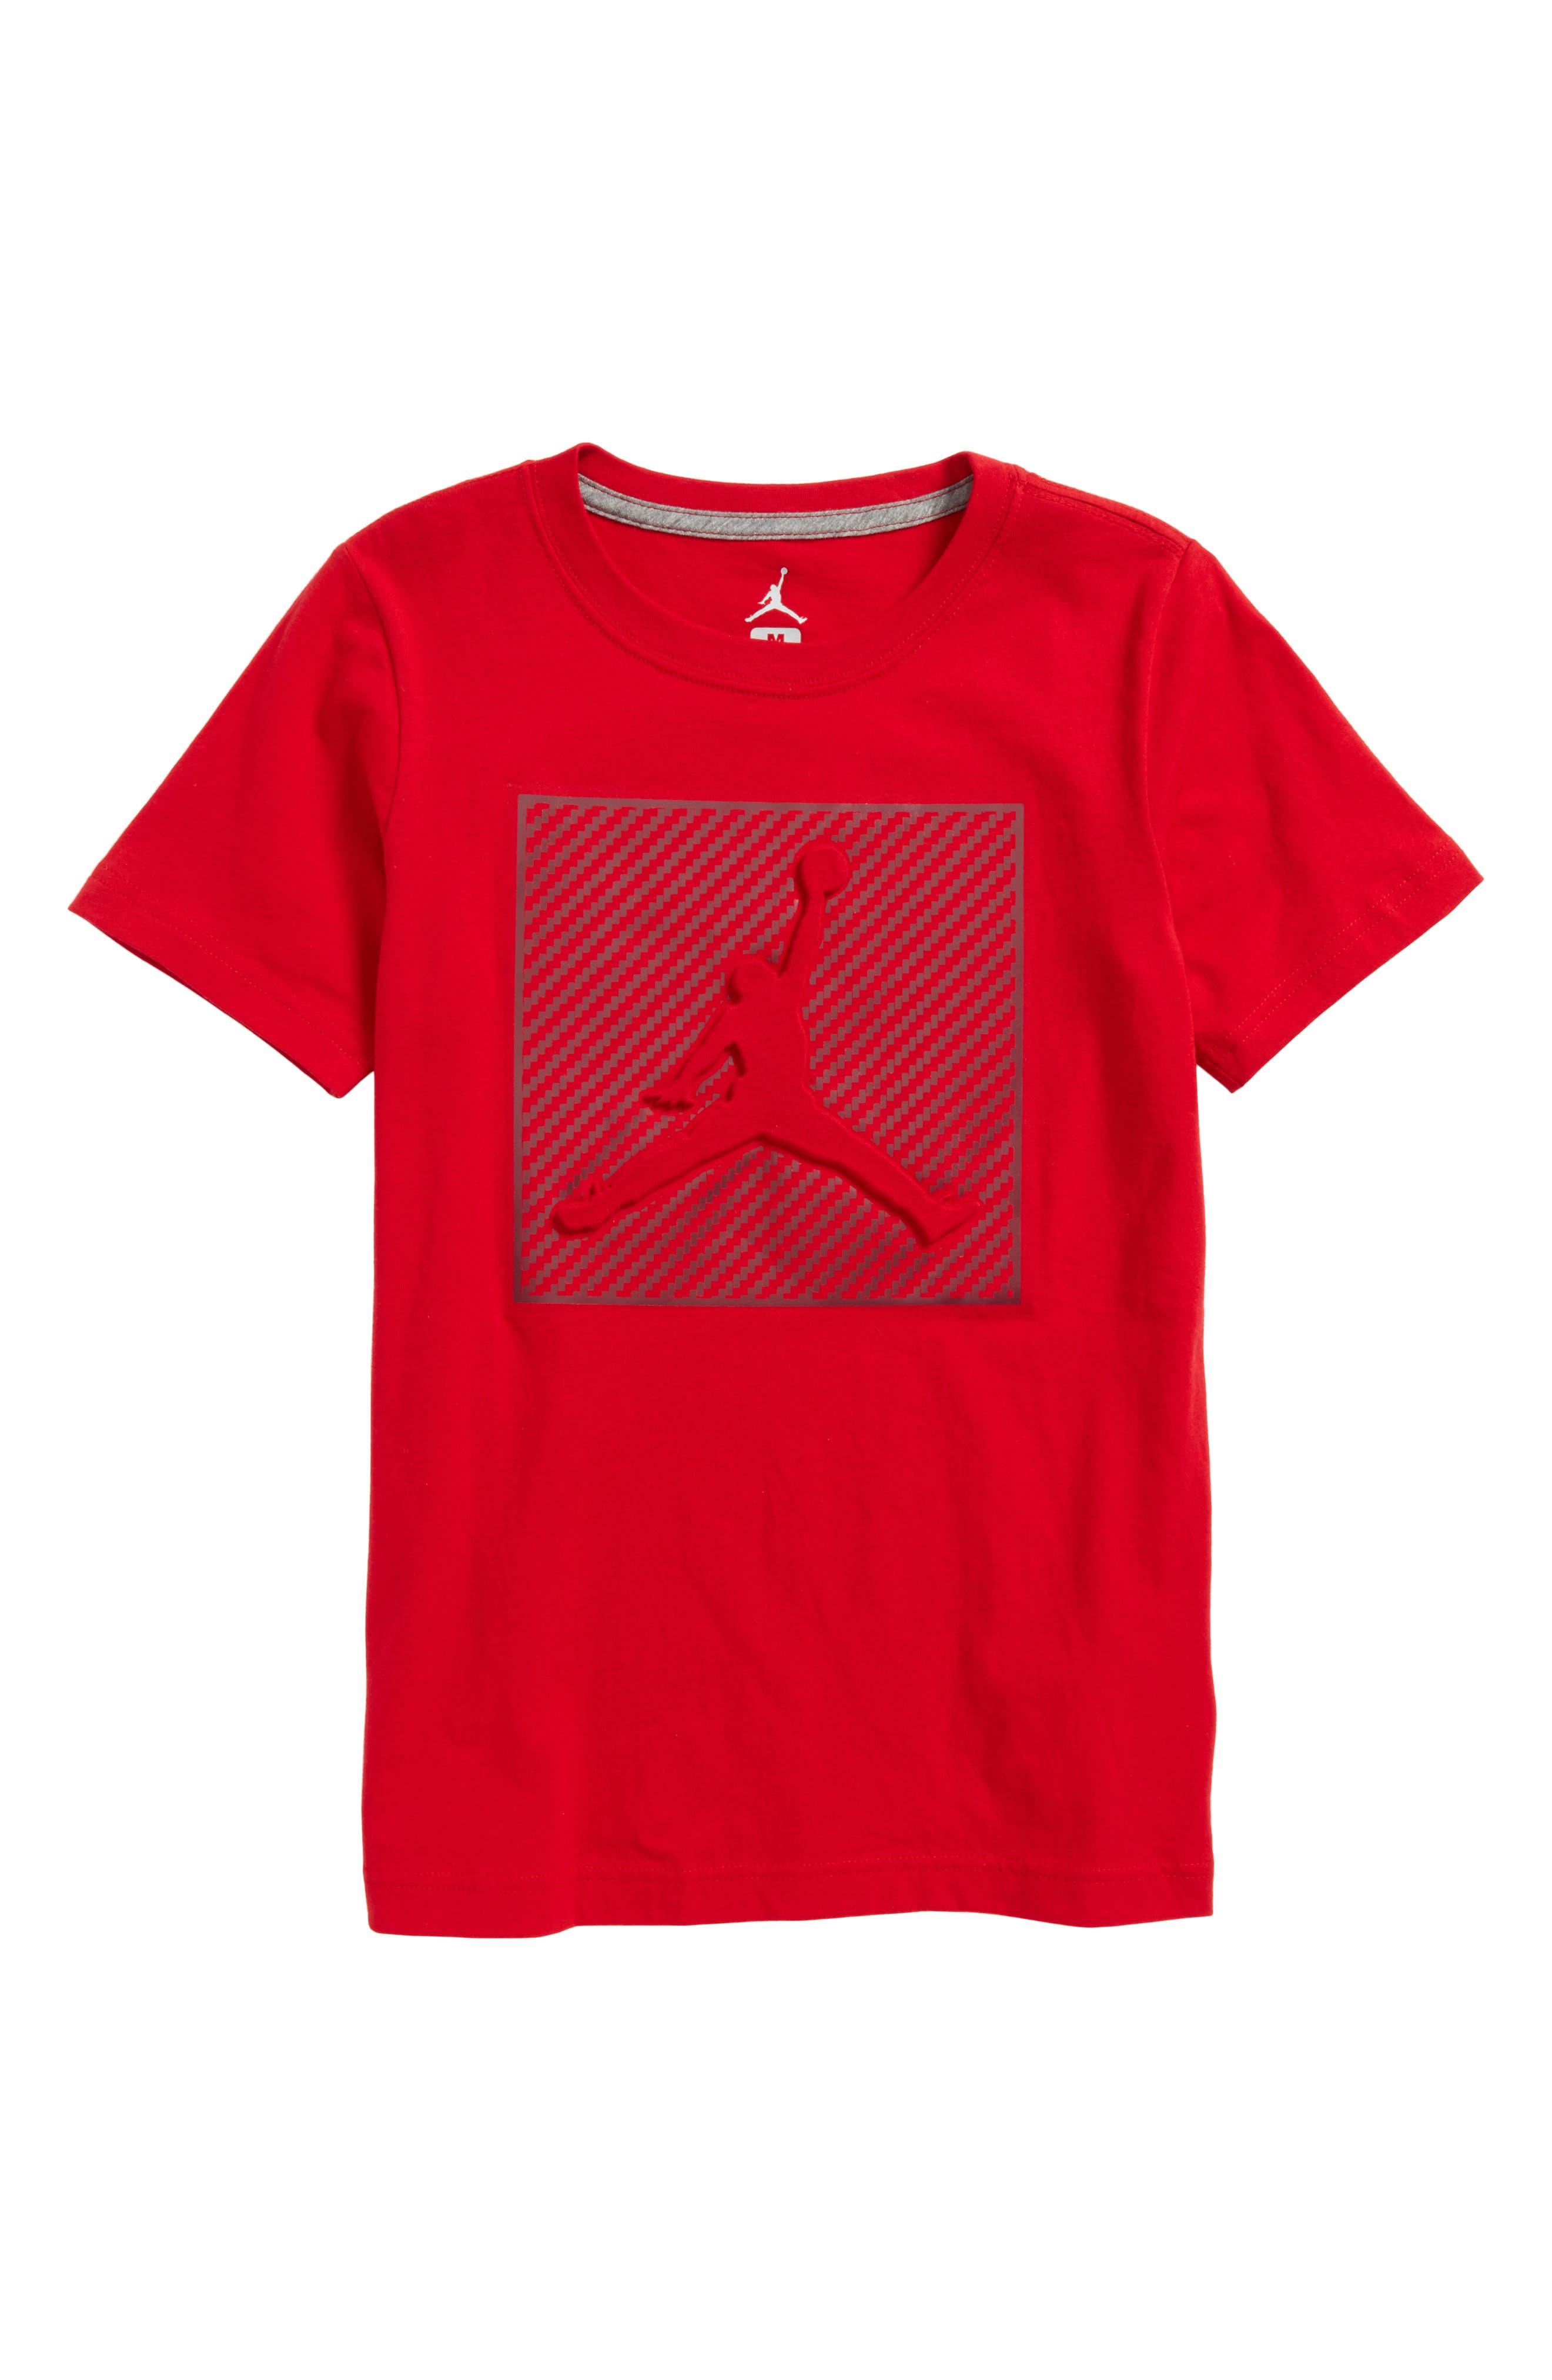 Main Image - Jordan AJ Emboss Carbon T-Shirt (Big Boys)